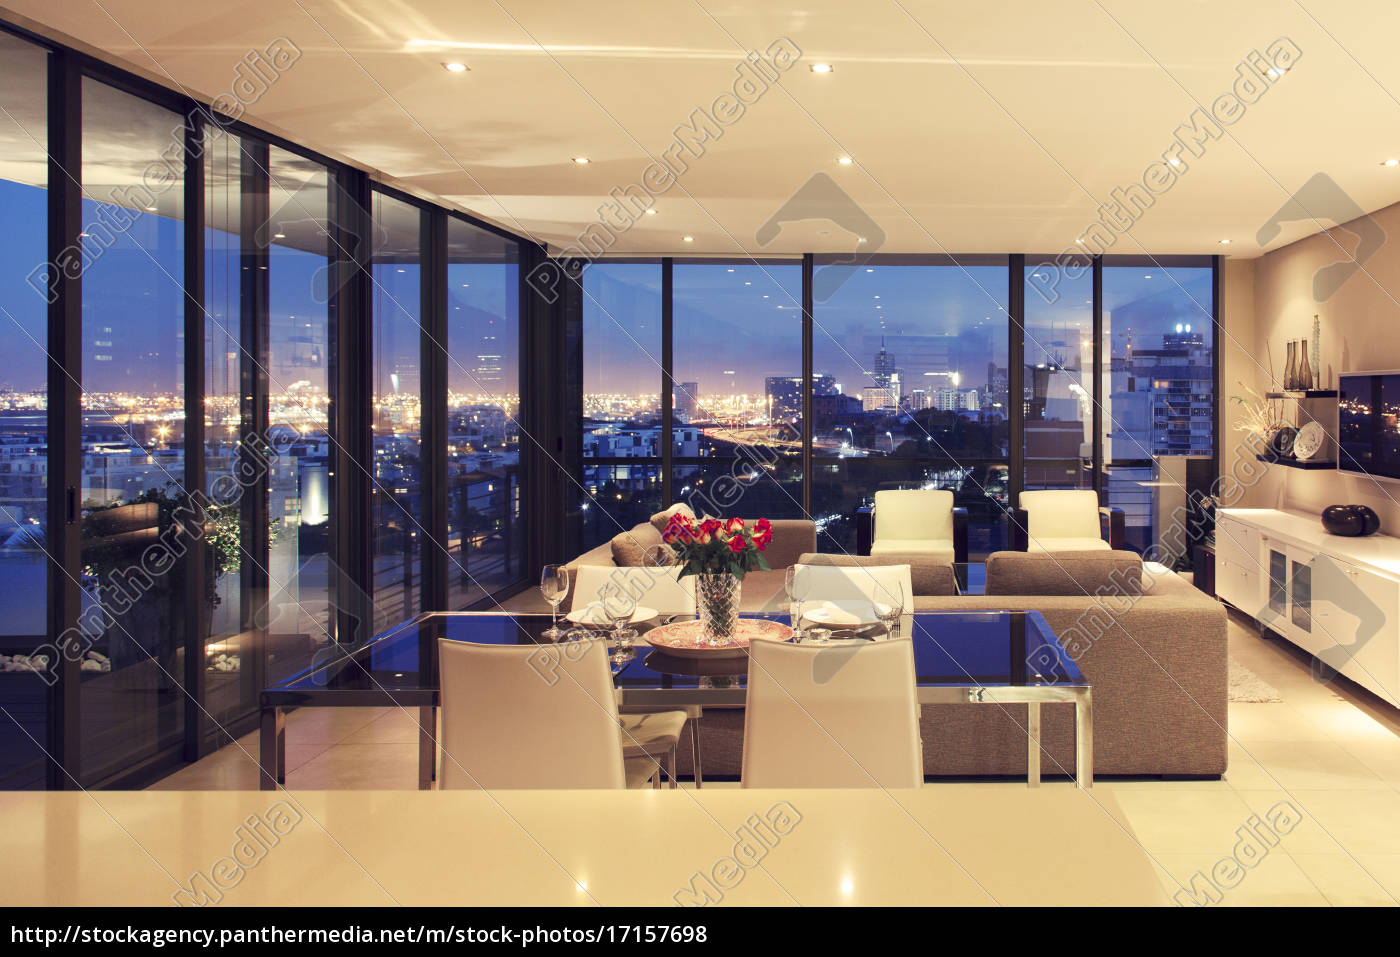 illuminated, modern, living, room, overlooking, city - 17157698